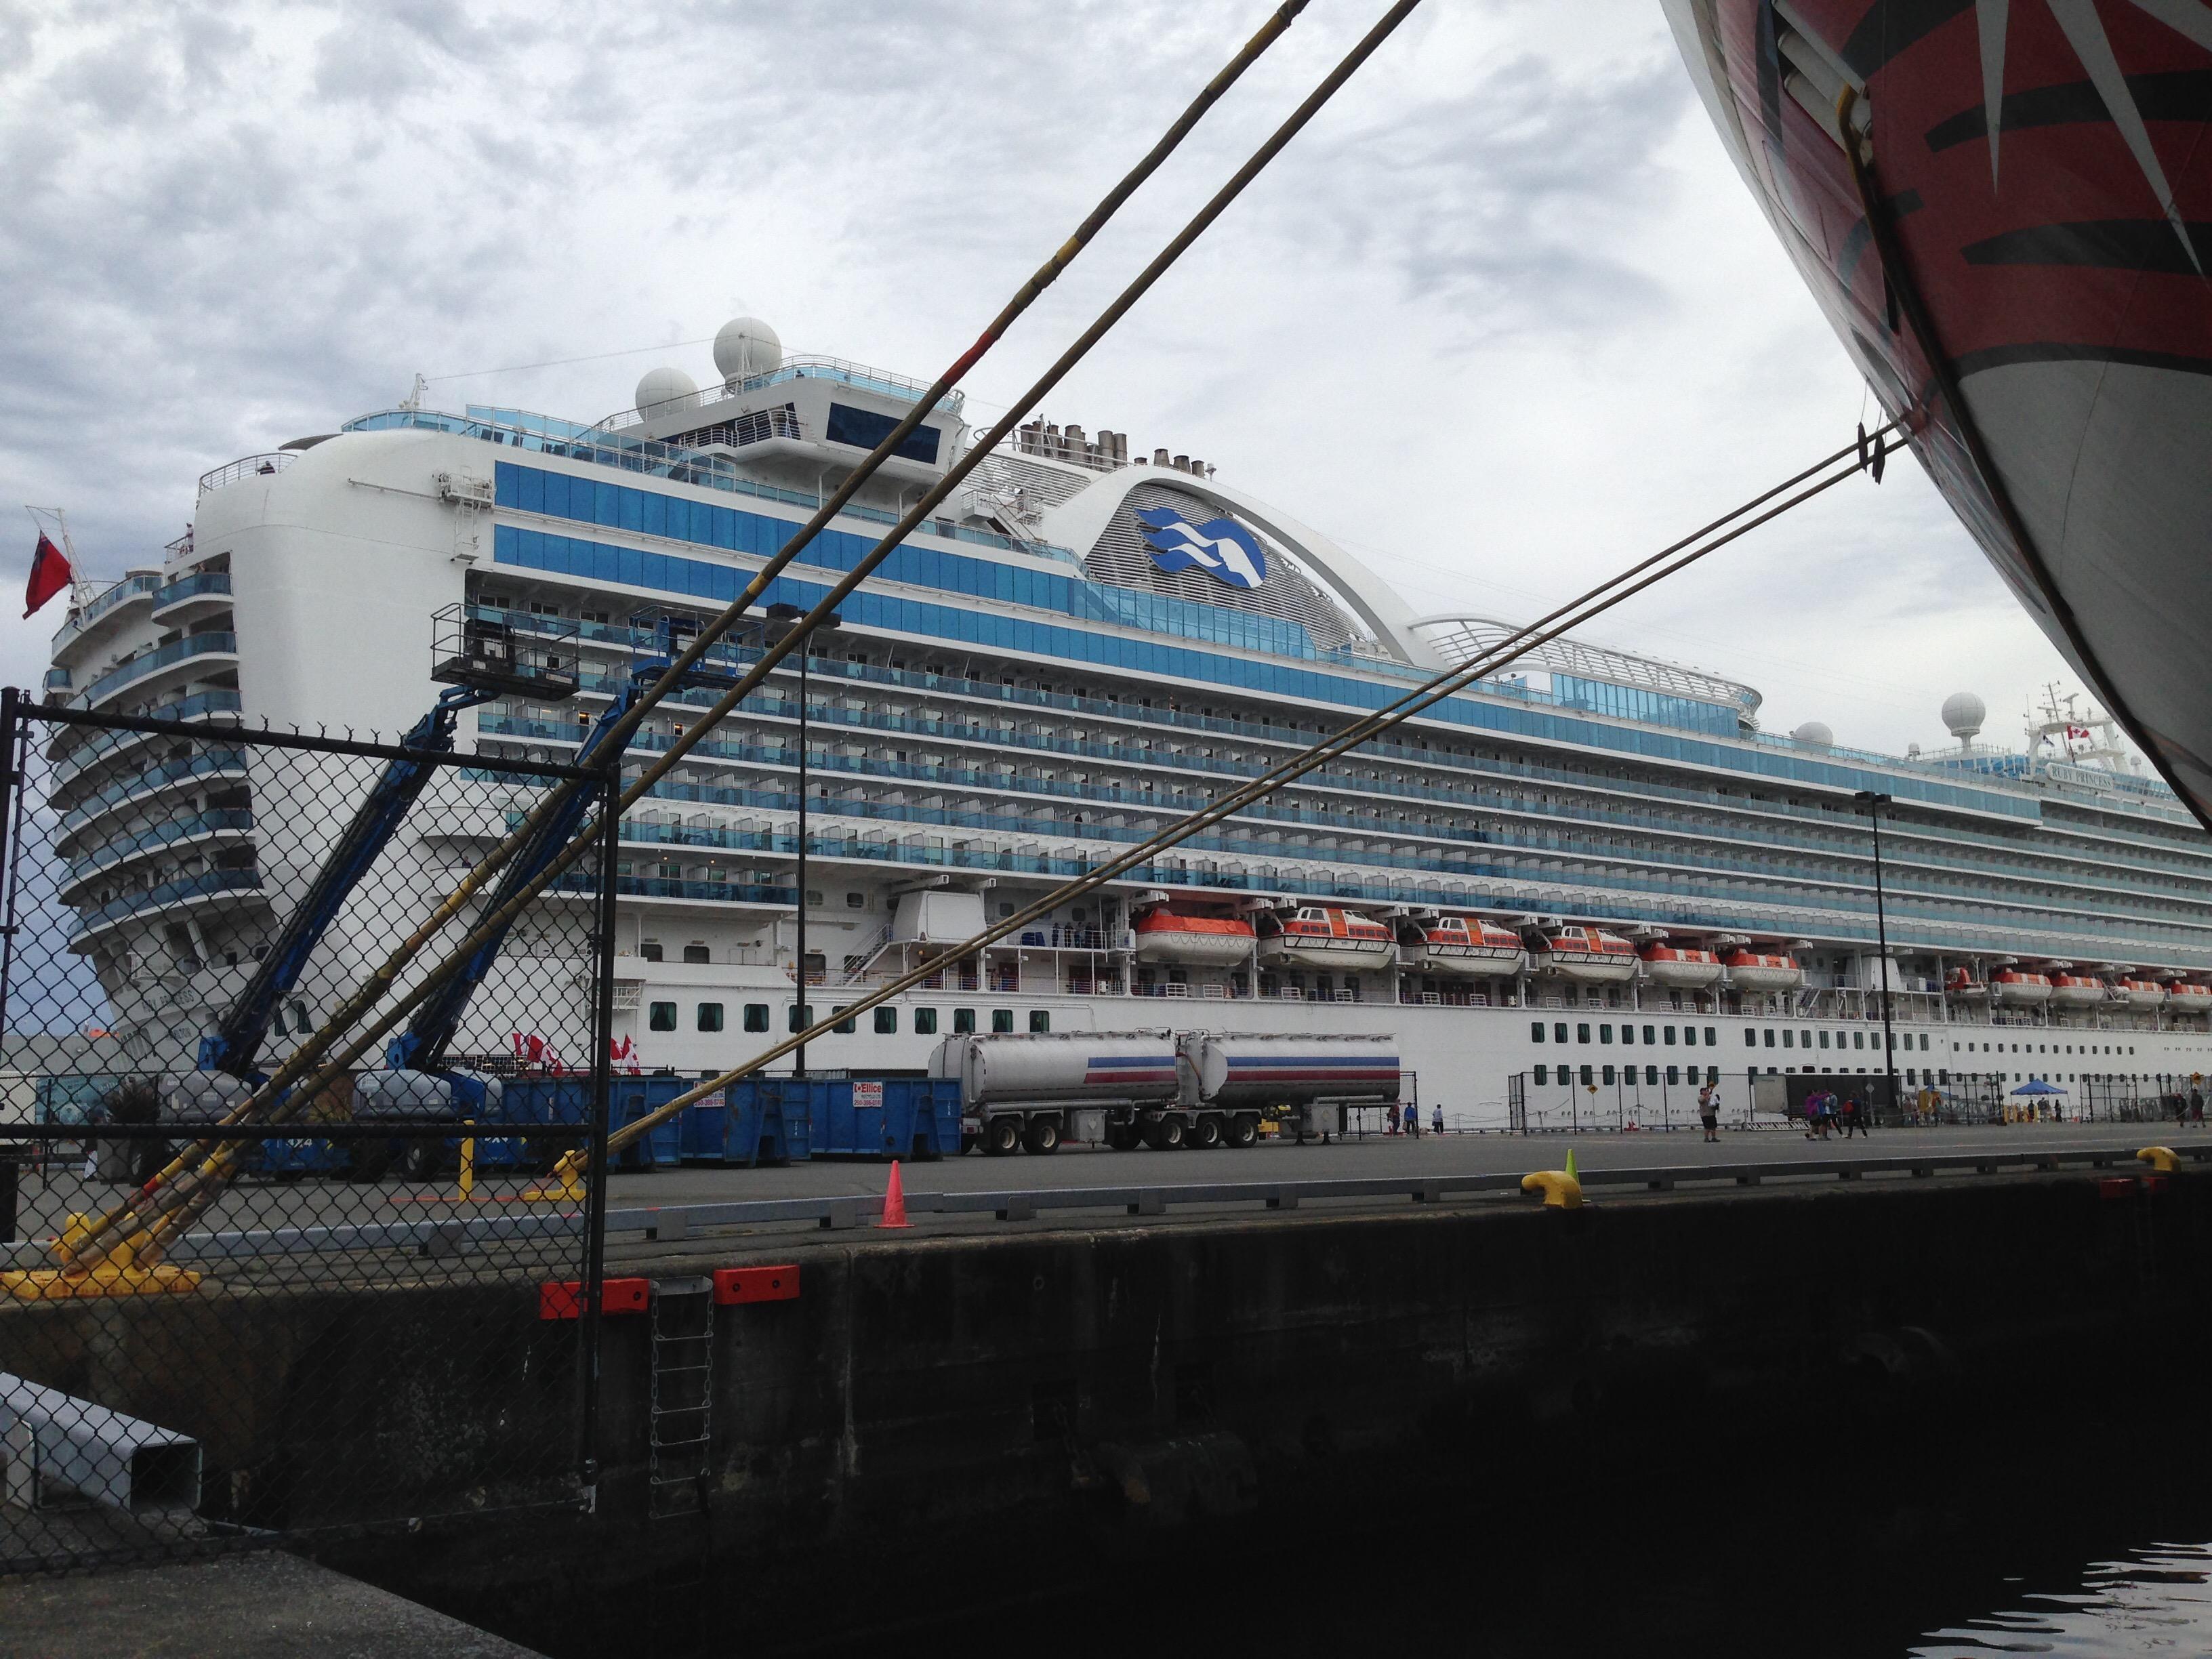 Robbar S Cruises 2018 Alaska Cruise Season Local